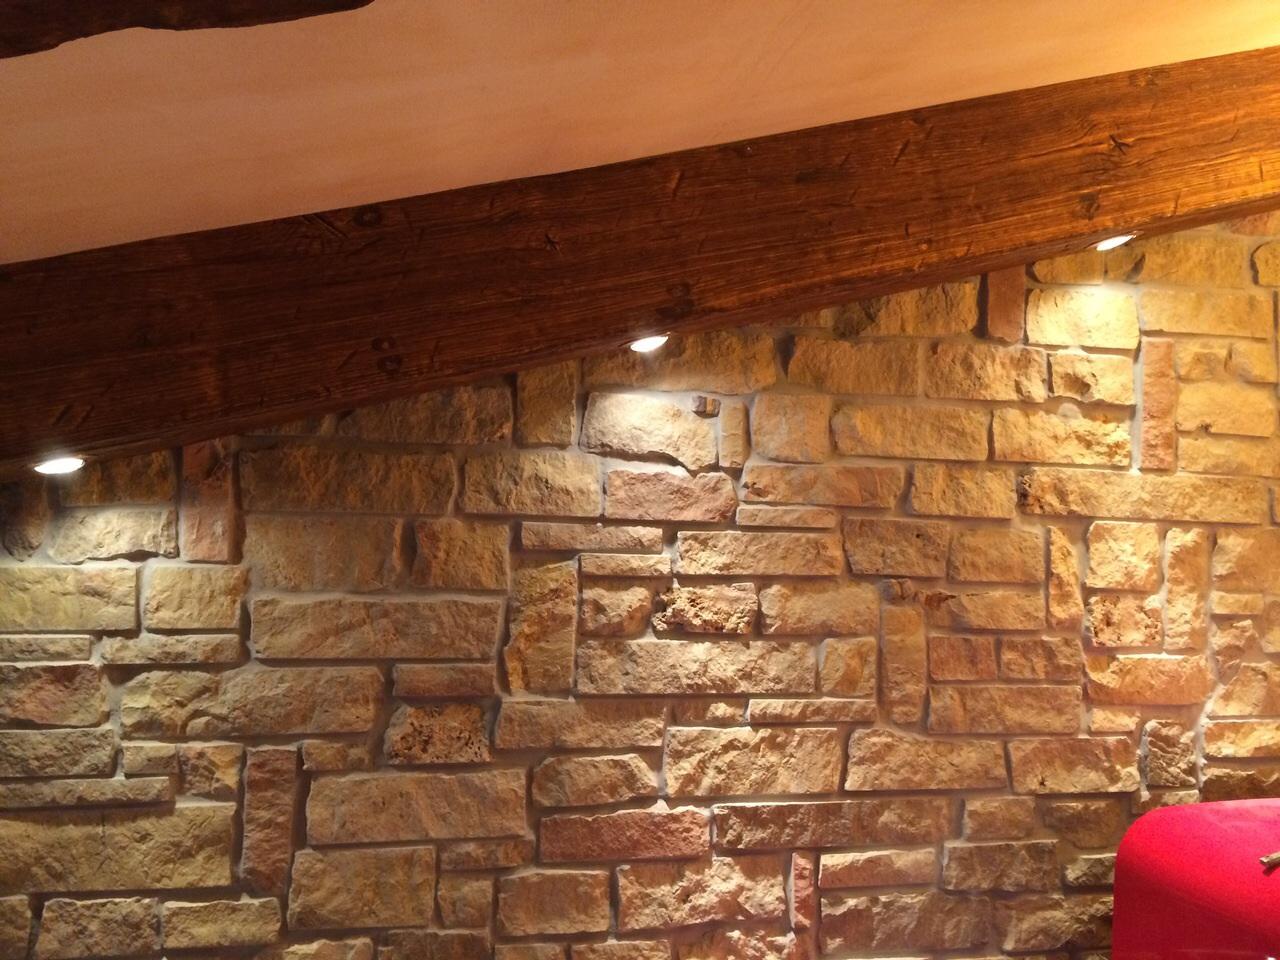 Rivestimento parete interna pietre raffaele cileo pietra di trani marmi mosaici graniti - Rivestimento parete interna ...